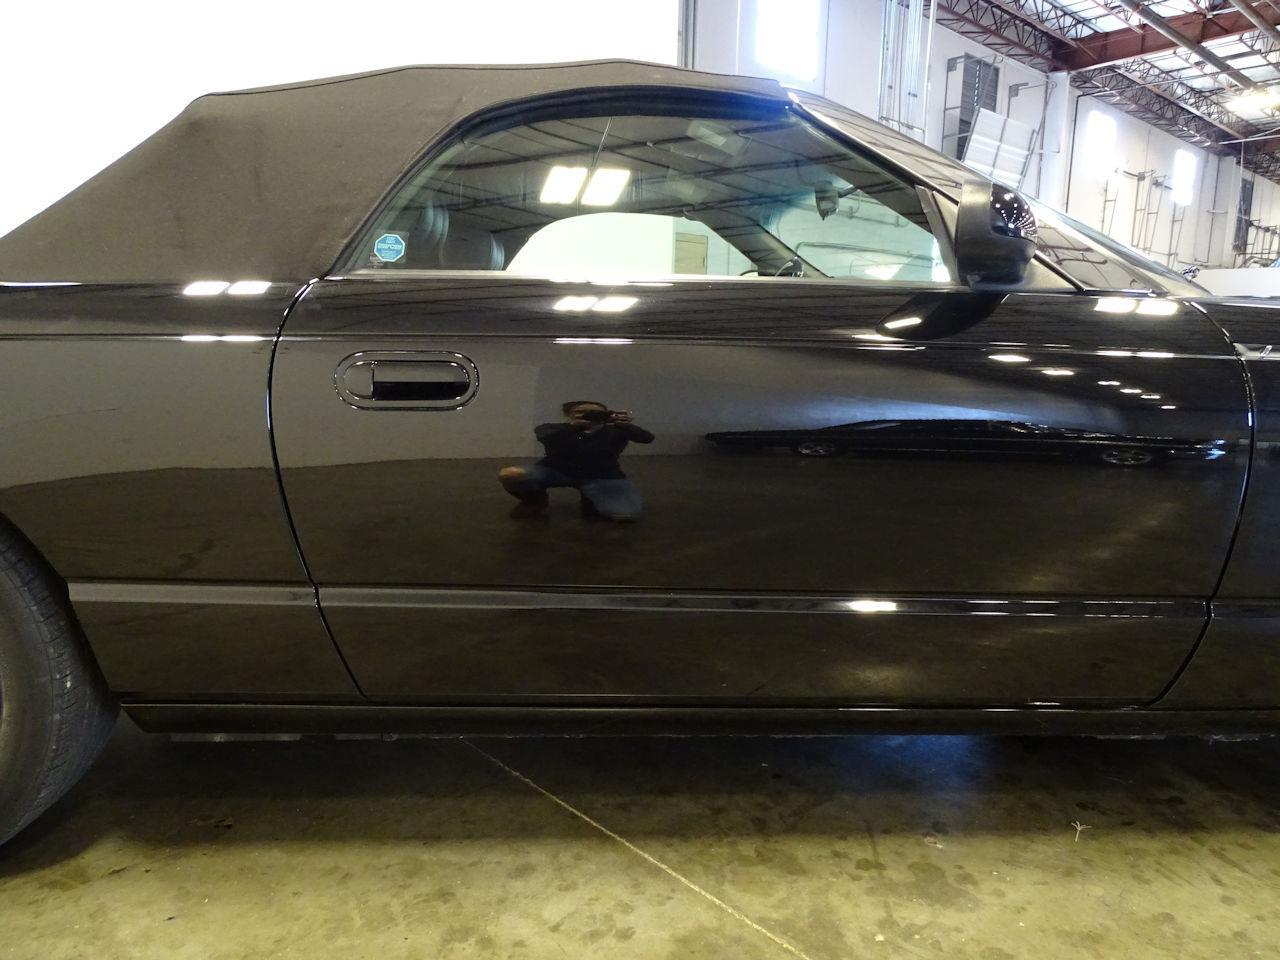 2002 Ford Thunderbird (CC-1342240) for sale in O'Fallon, Illinois